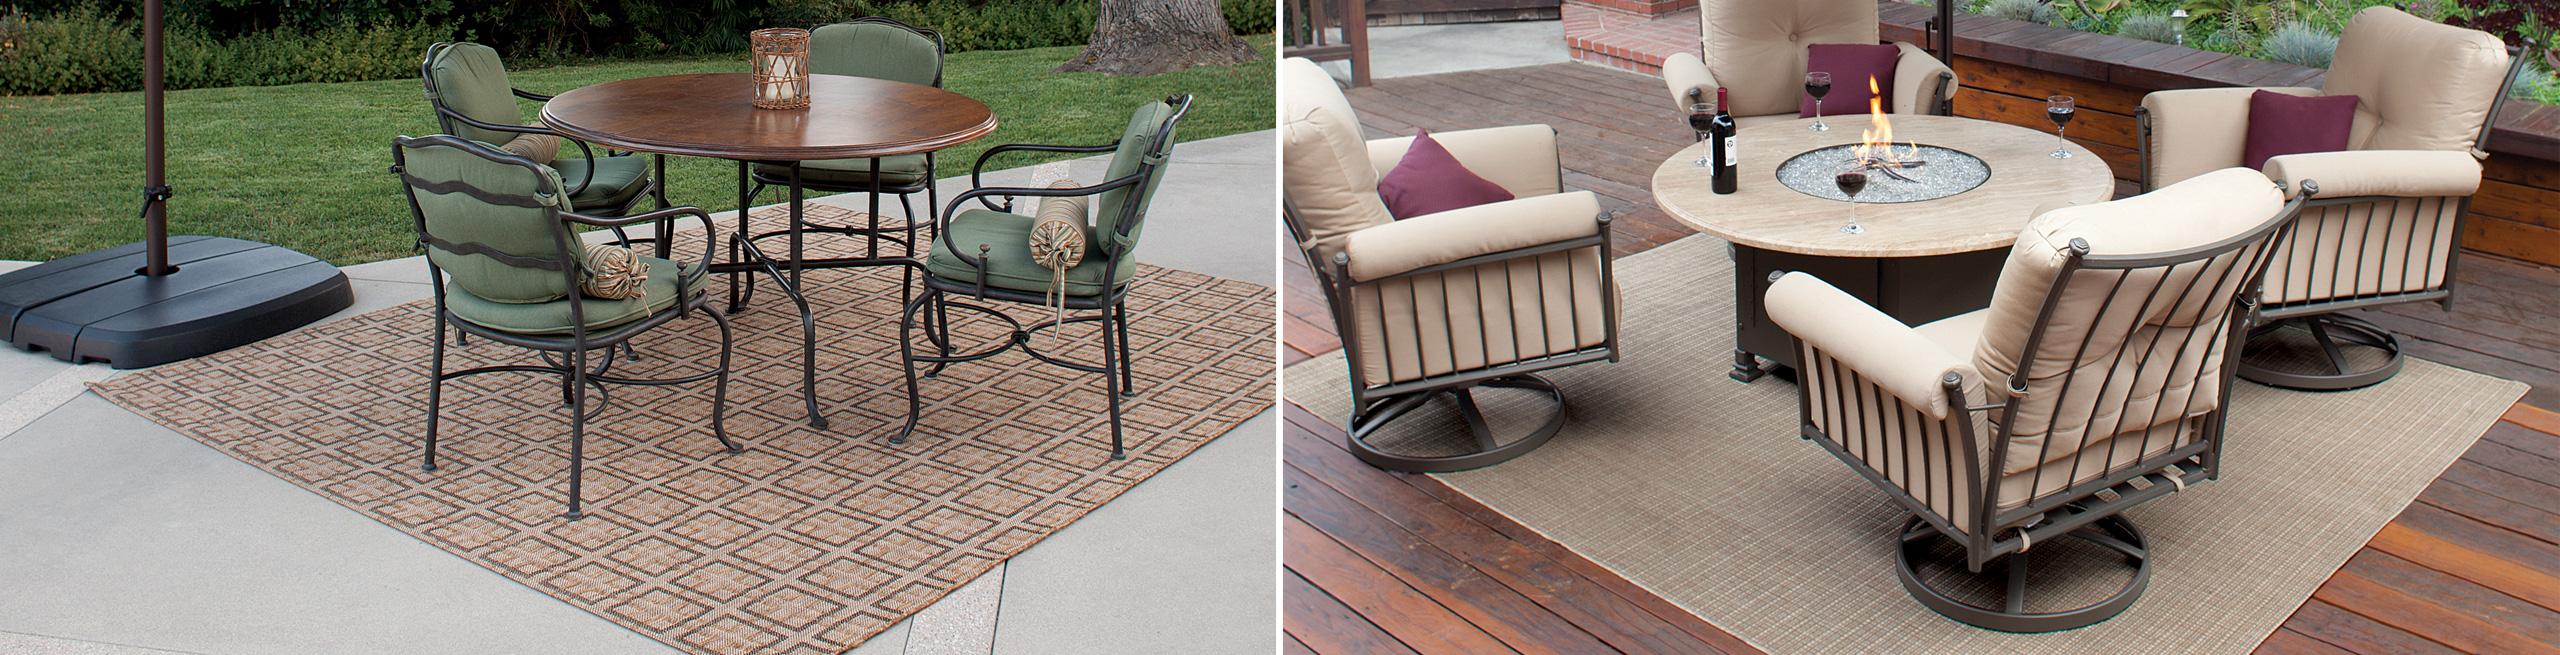 patio rugs outdoor rugs DTEOXBM